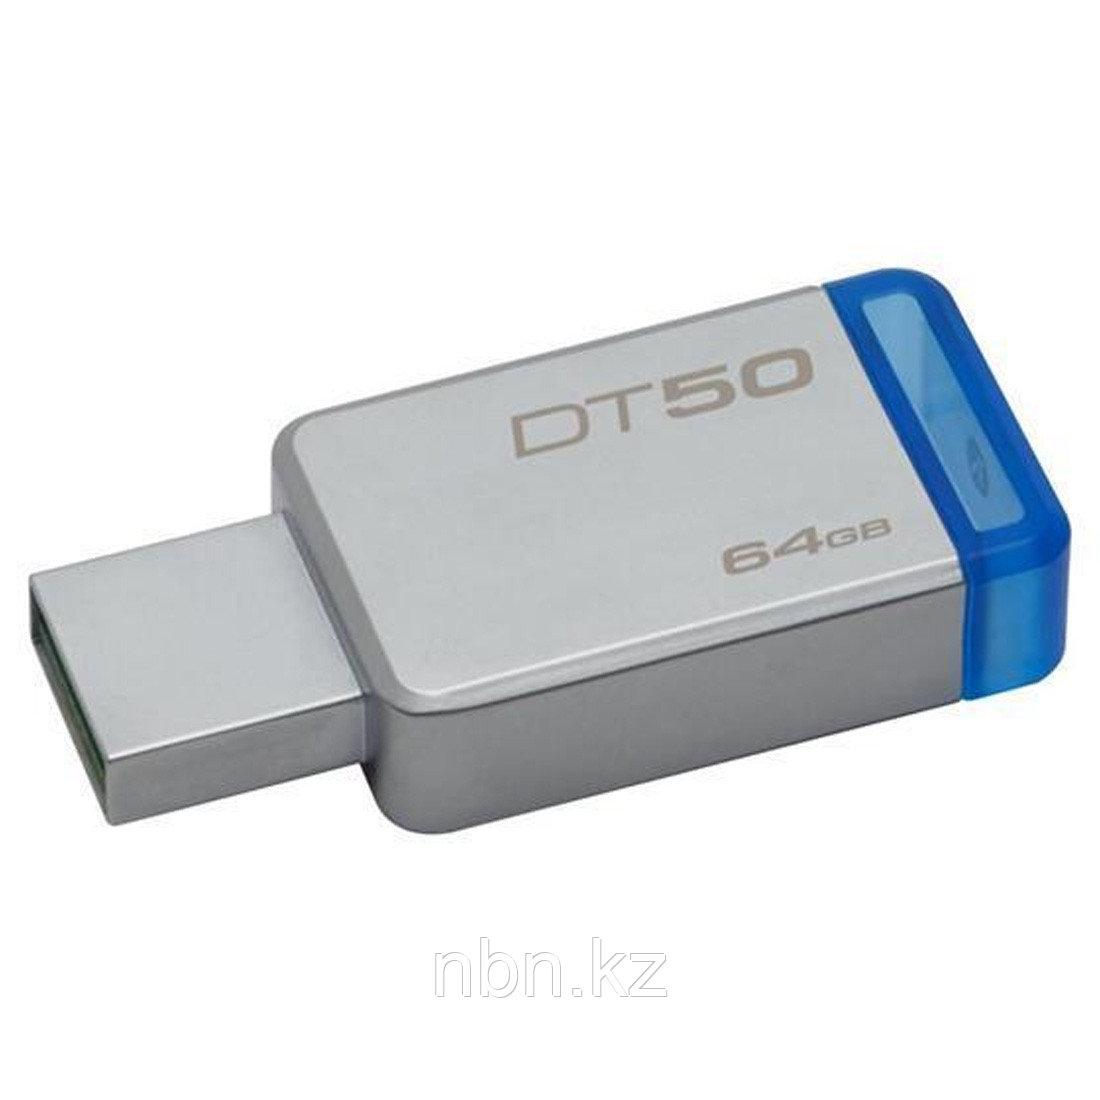 USB-накопитель Kingston DataTraveler® 50  (DT50) 64GB